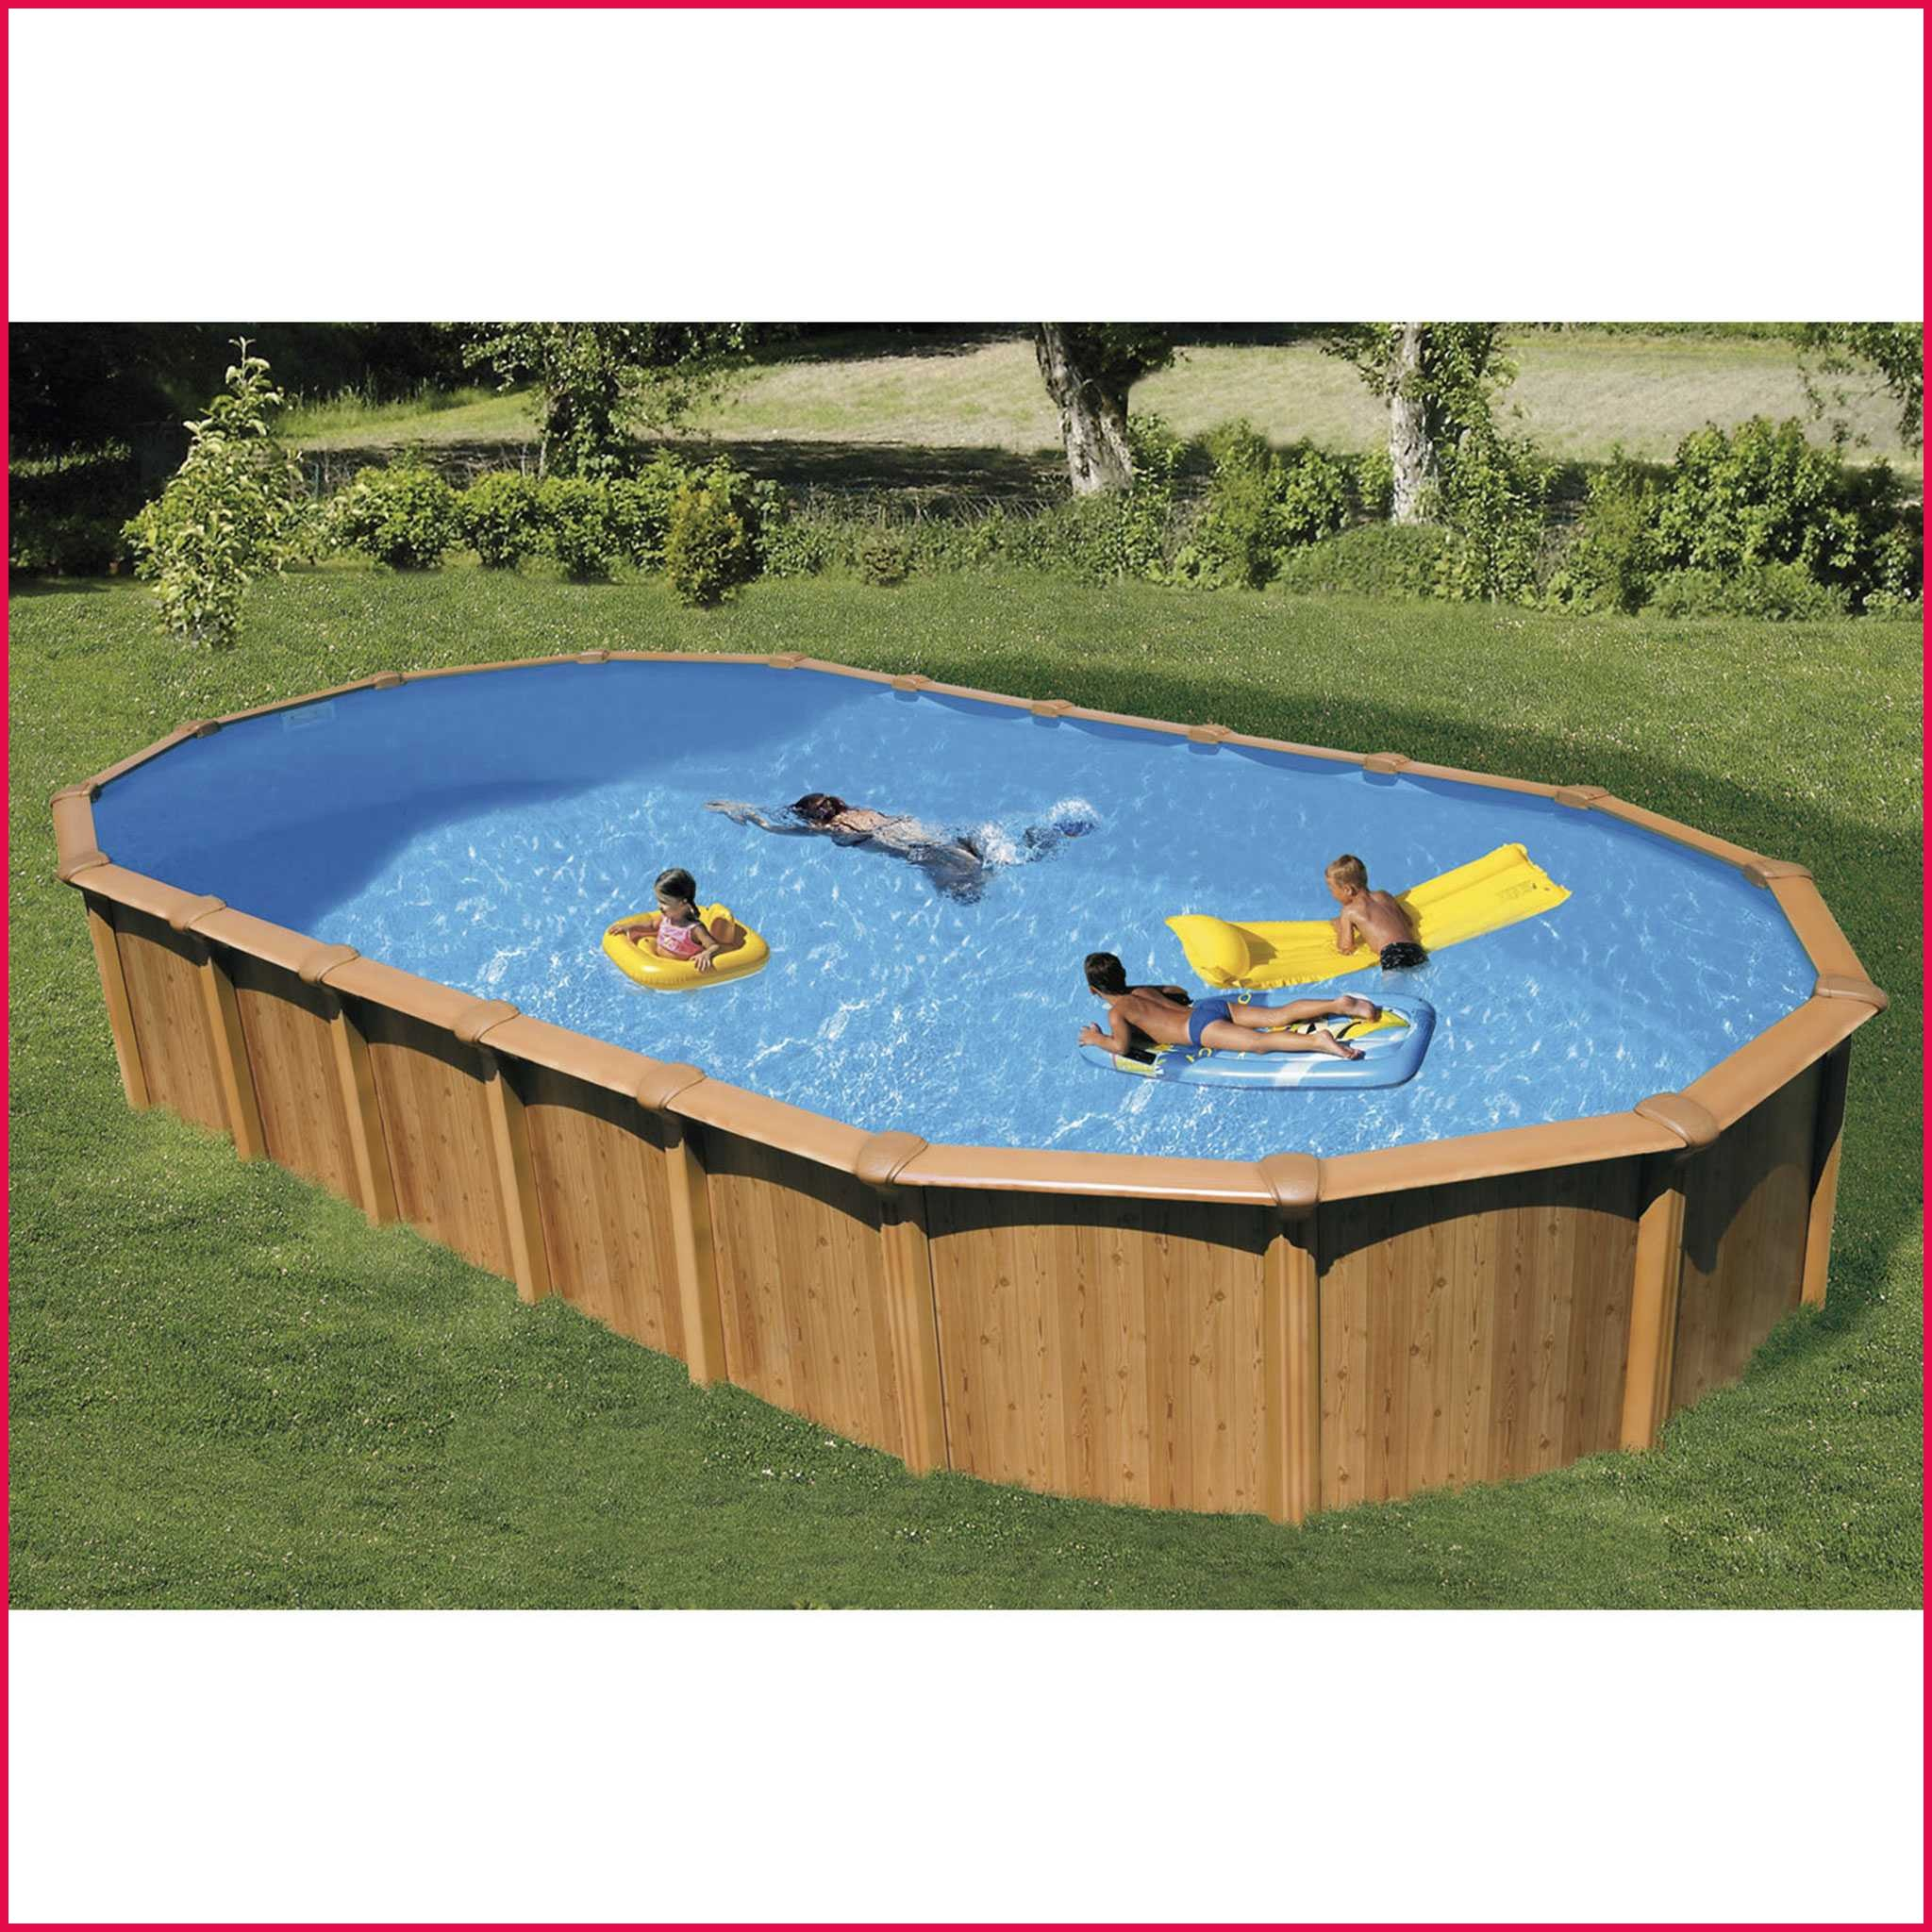 aspirateur piscine hors sol auchan